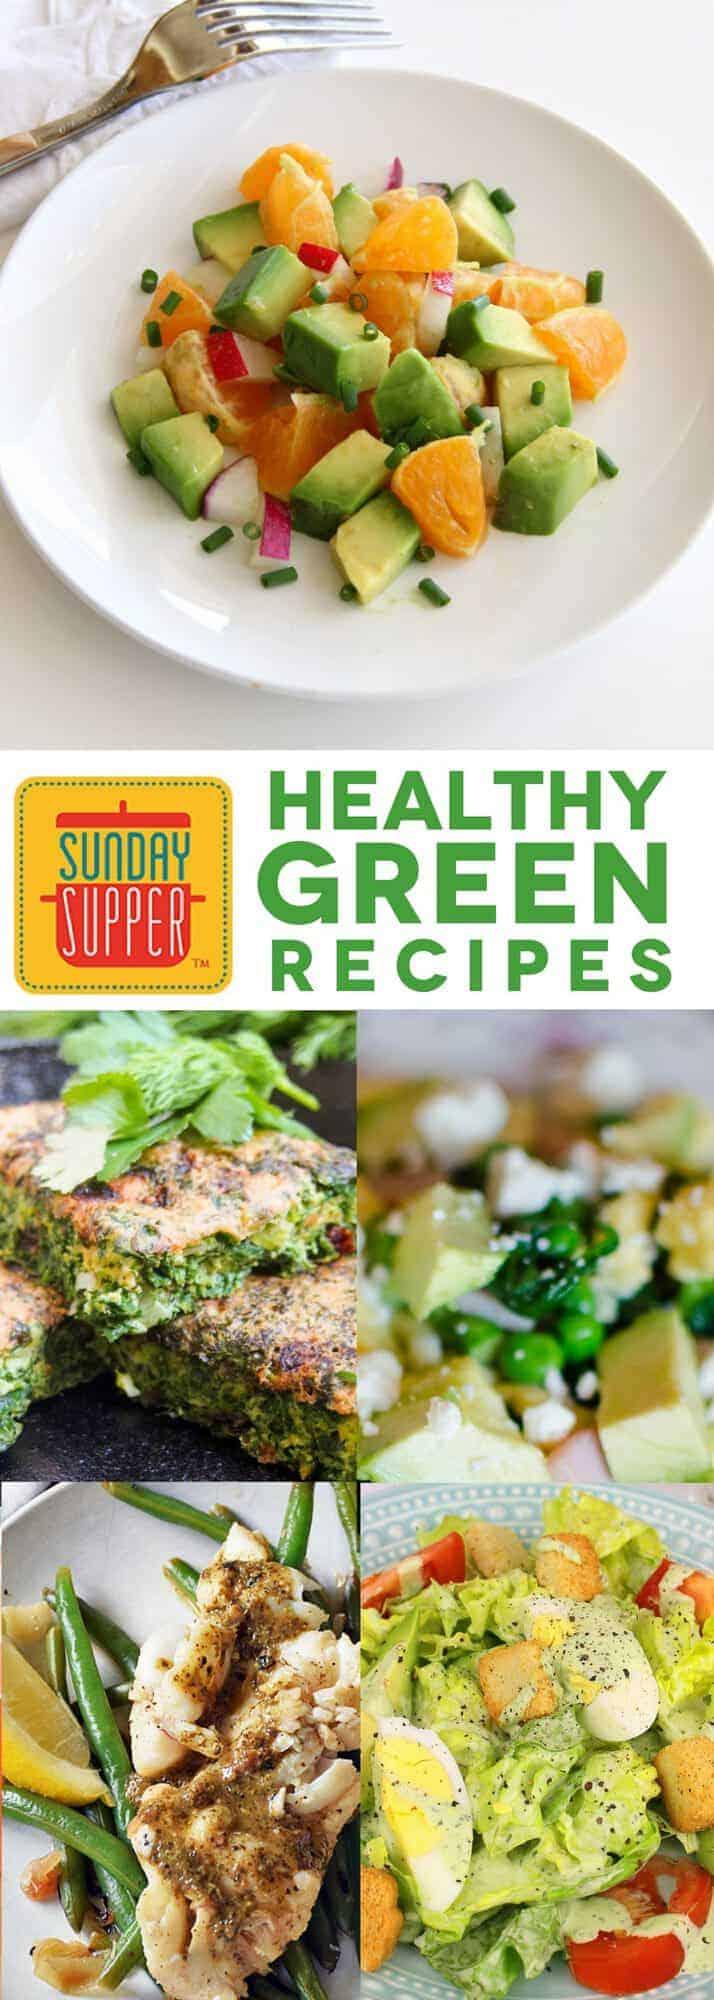 healthy green recipes